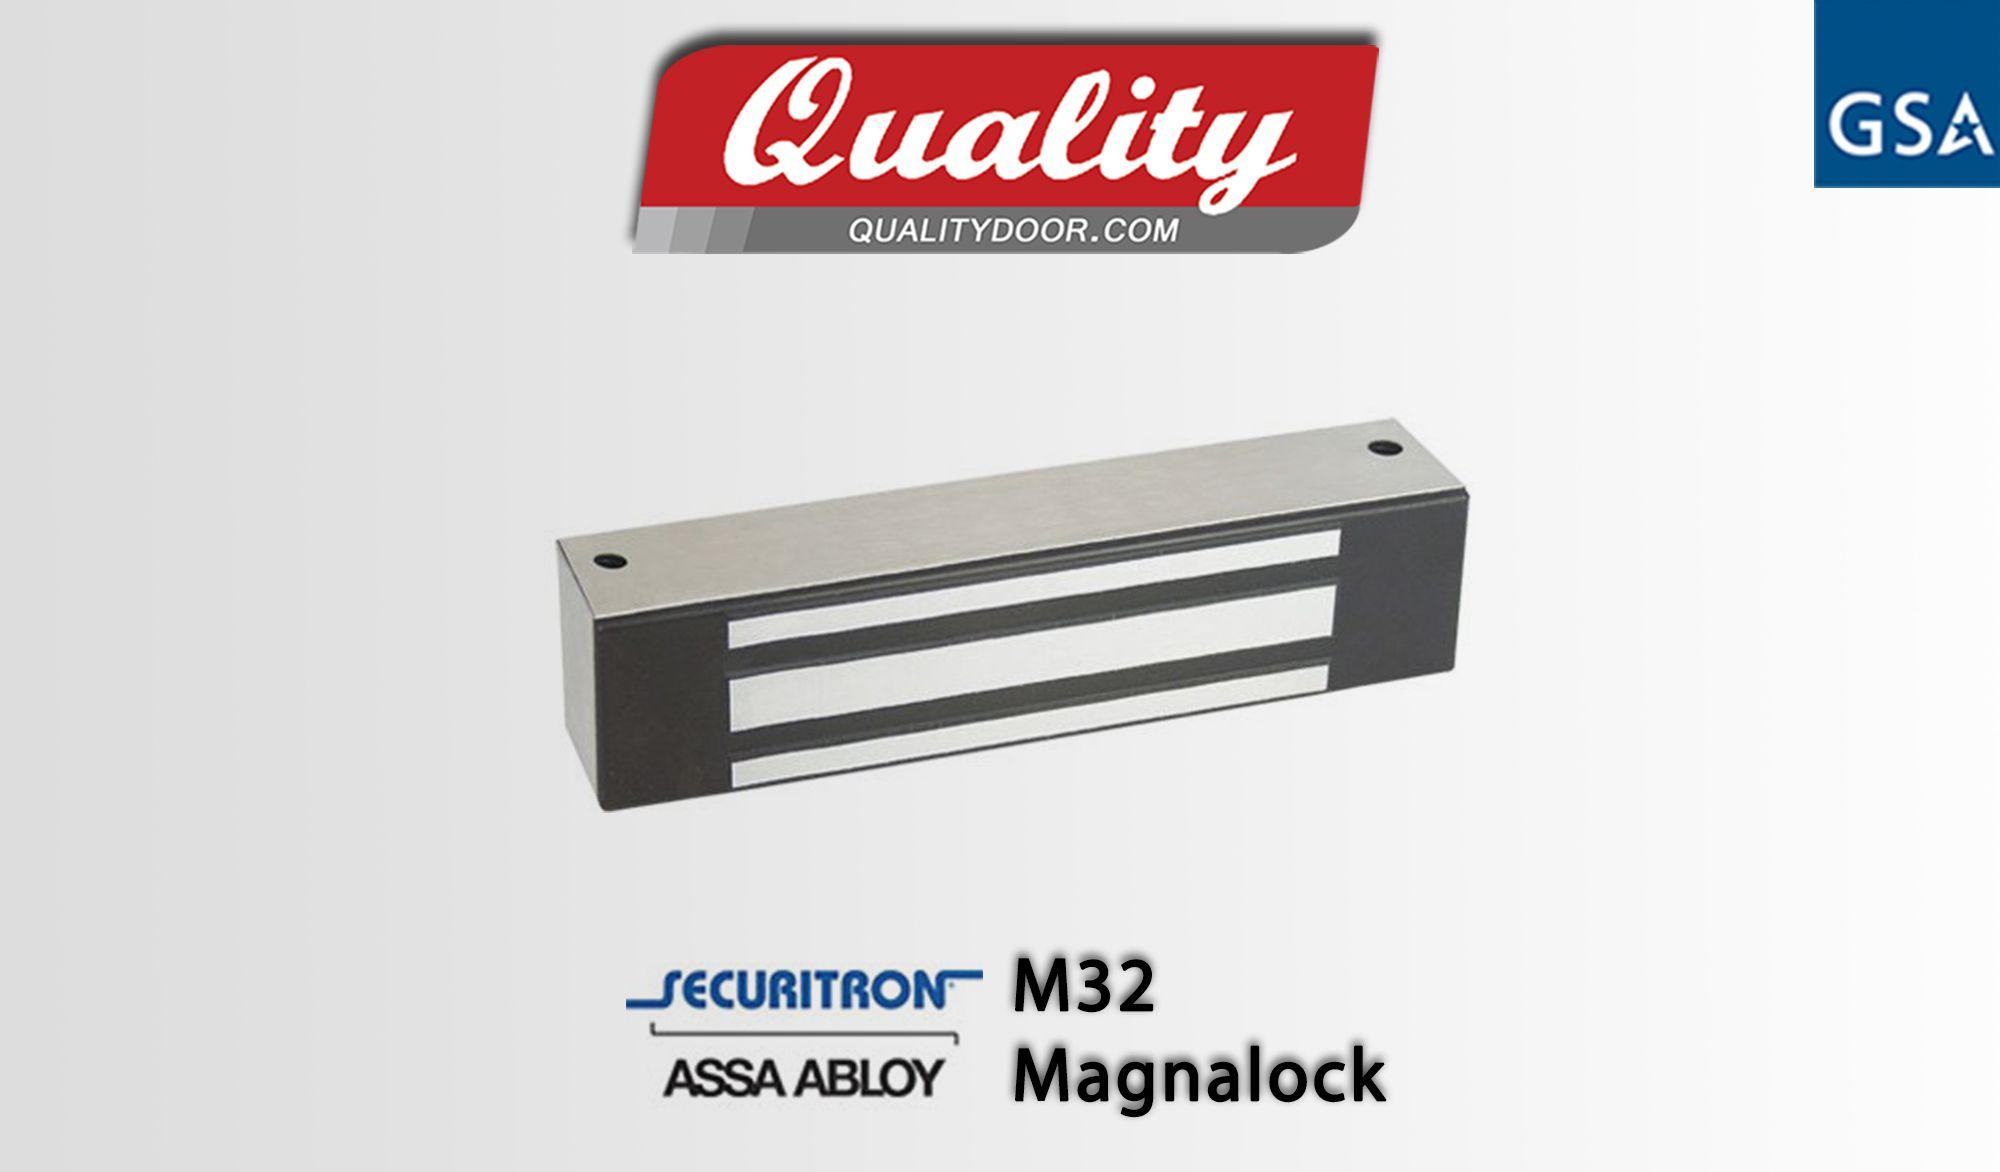 Securitron M32 Magnalock Healthcare Design Electromagnetic Lock Nyc Construction